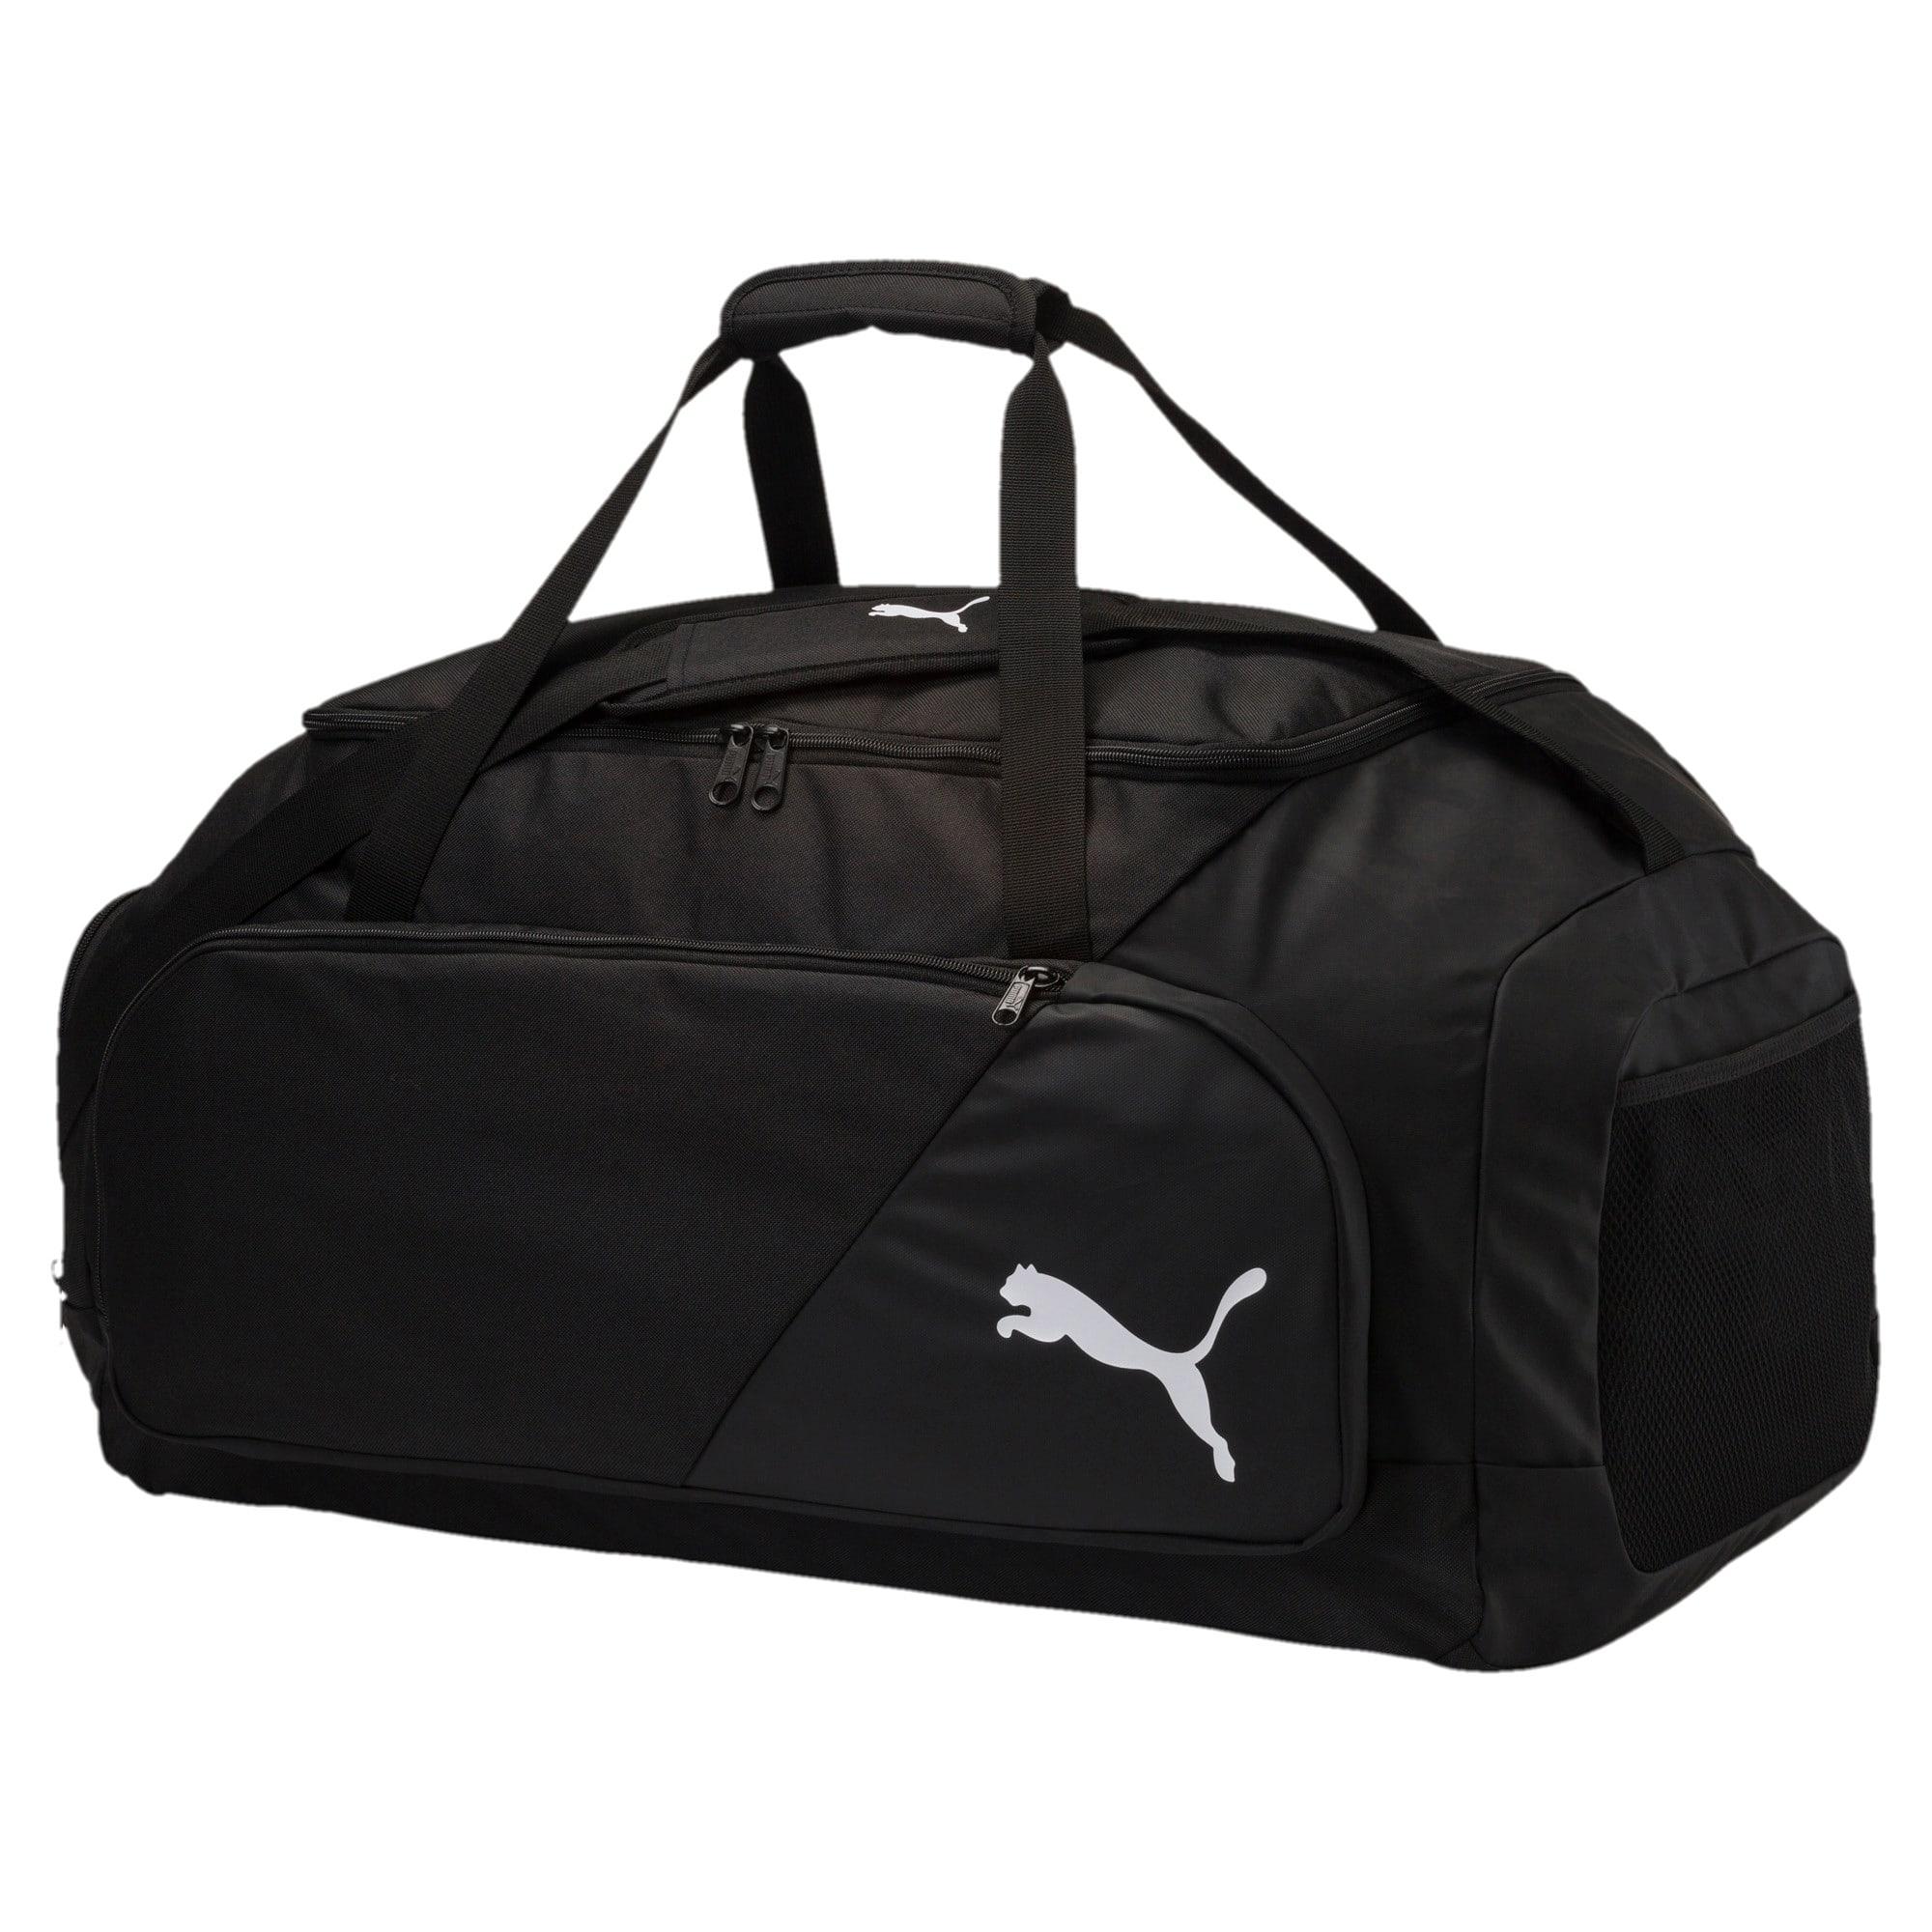 Thumbnail 1 of Liga Large Bag, Puma Black, medium